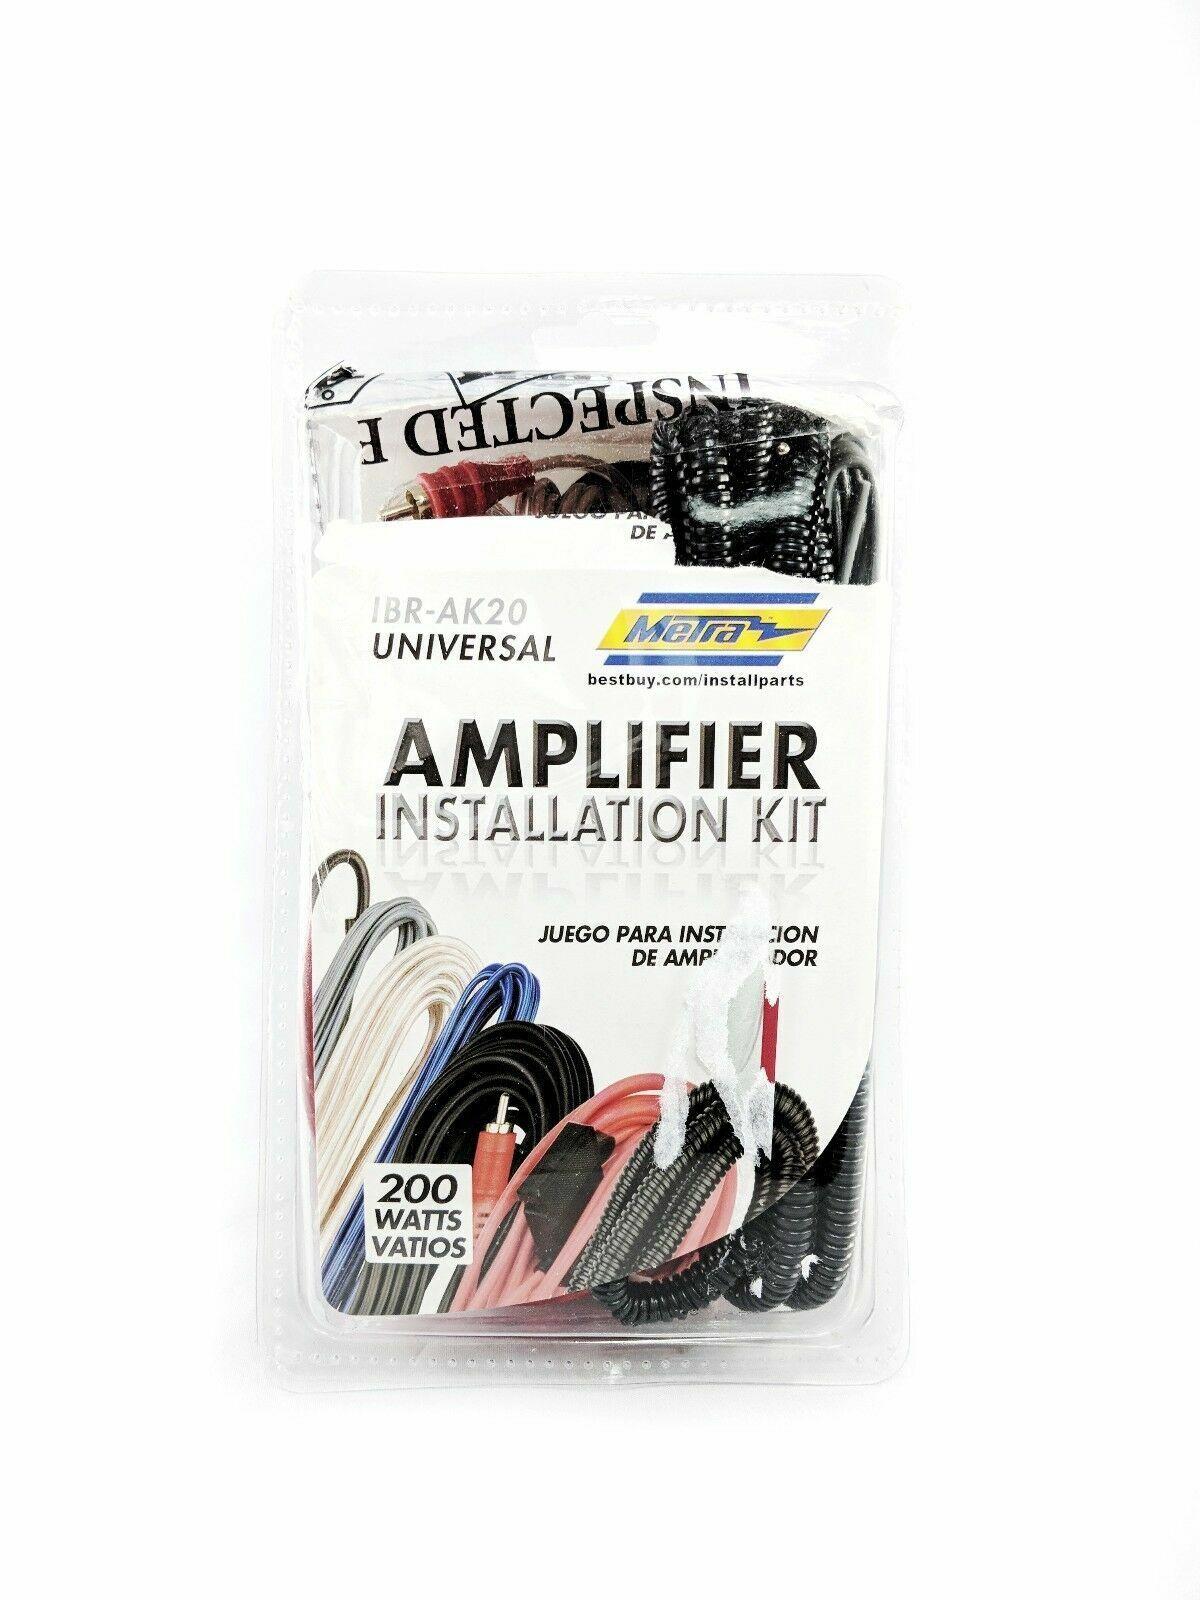 Authentic Metra Ibr-ak20 200w Amplifier Installation Kit Fast